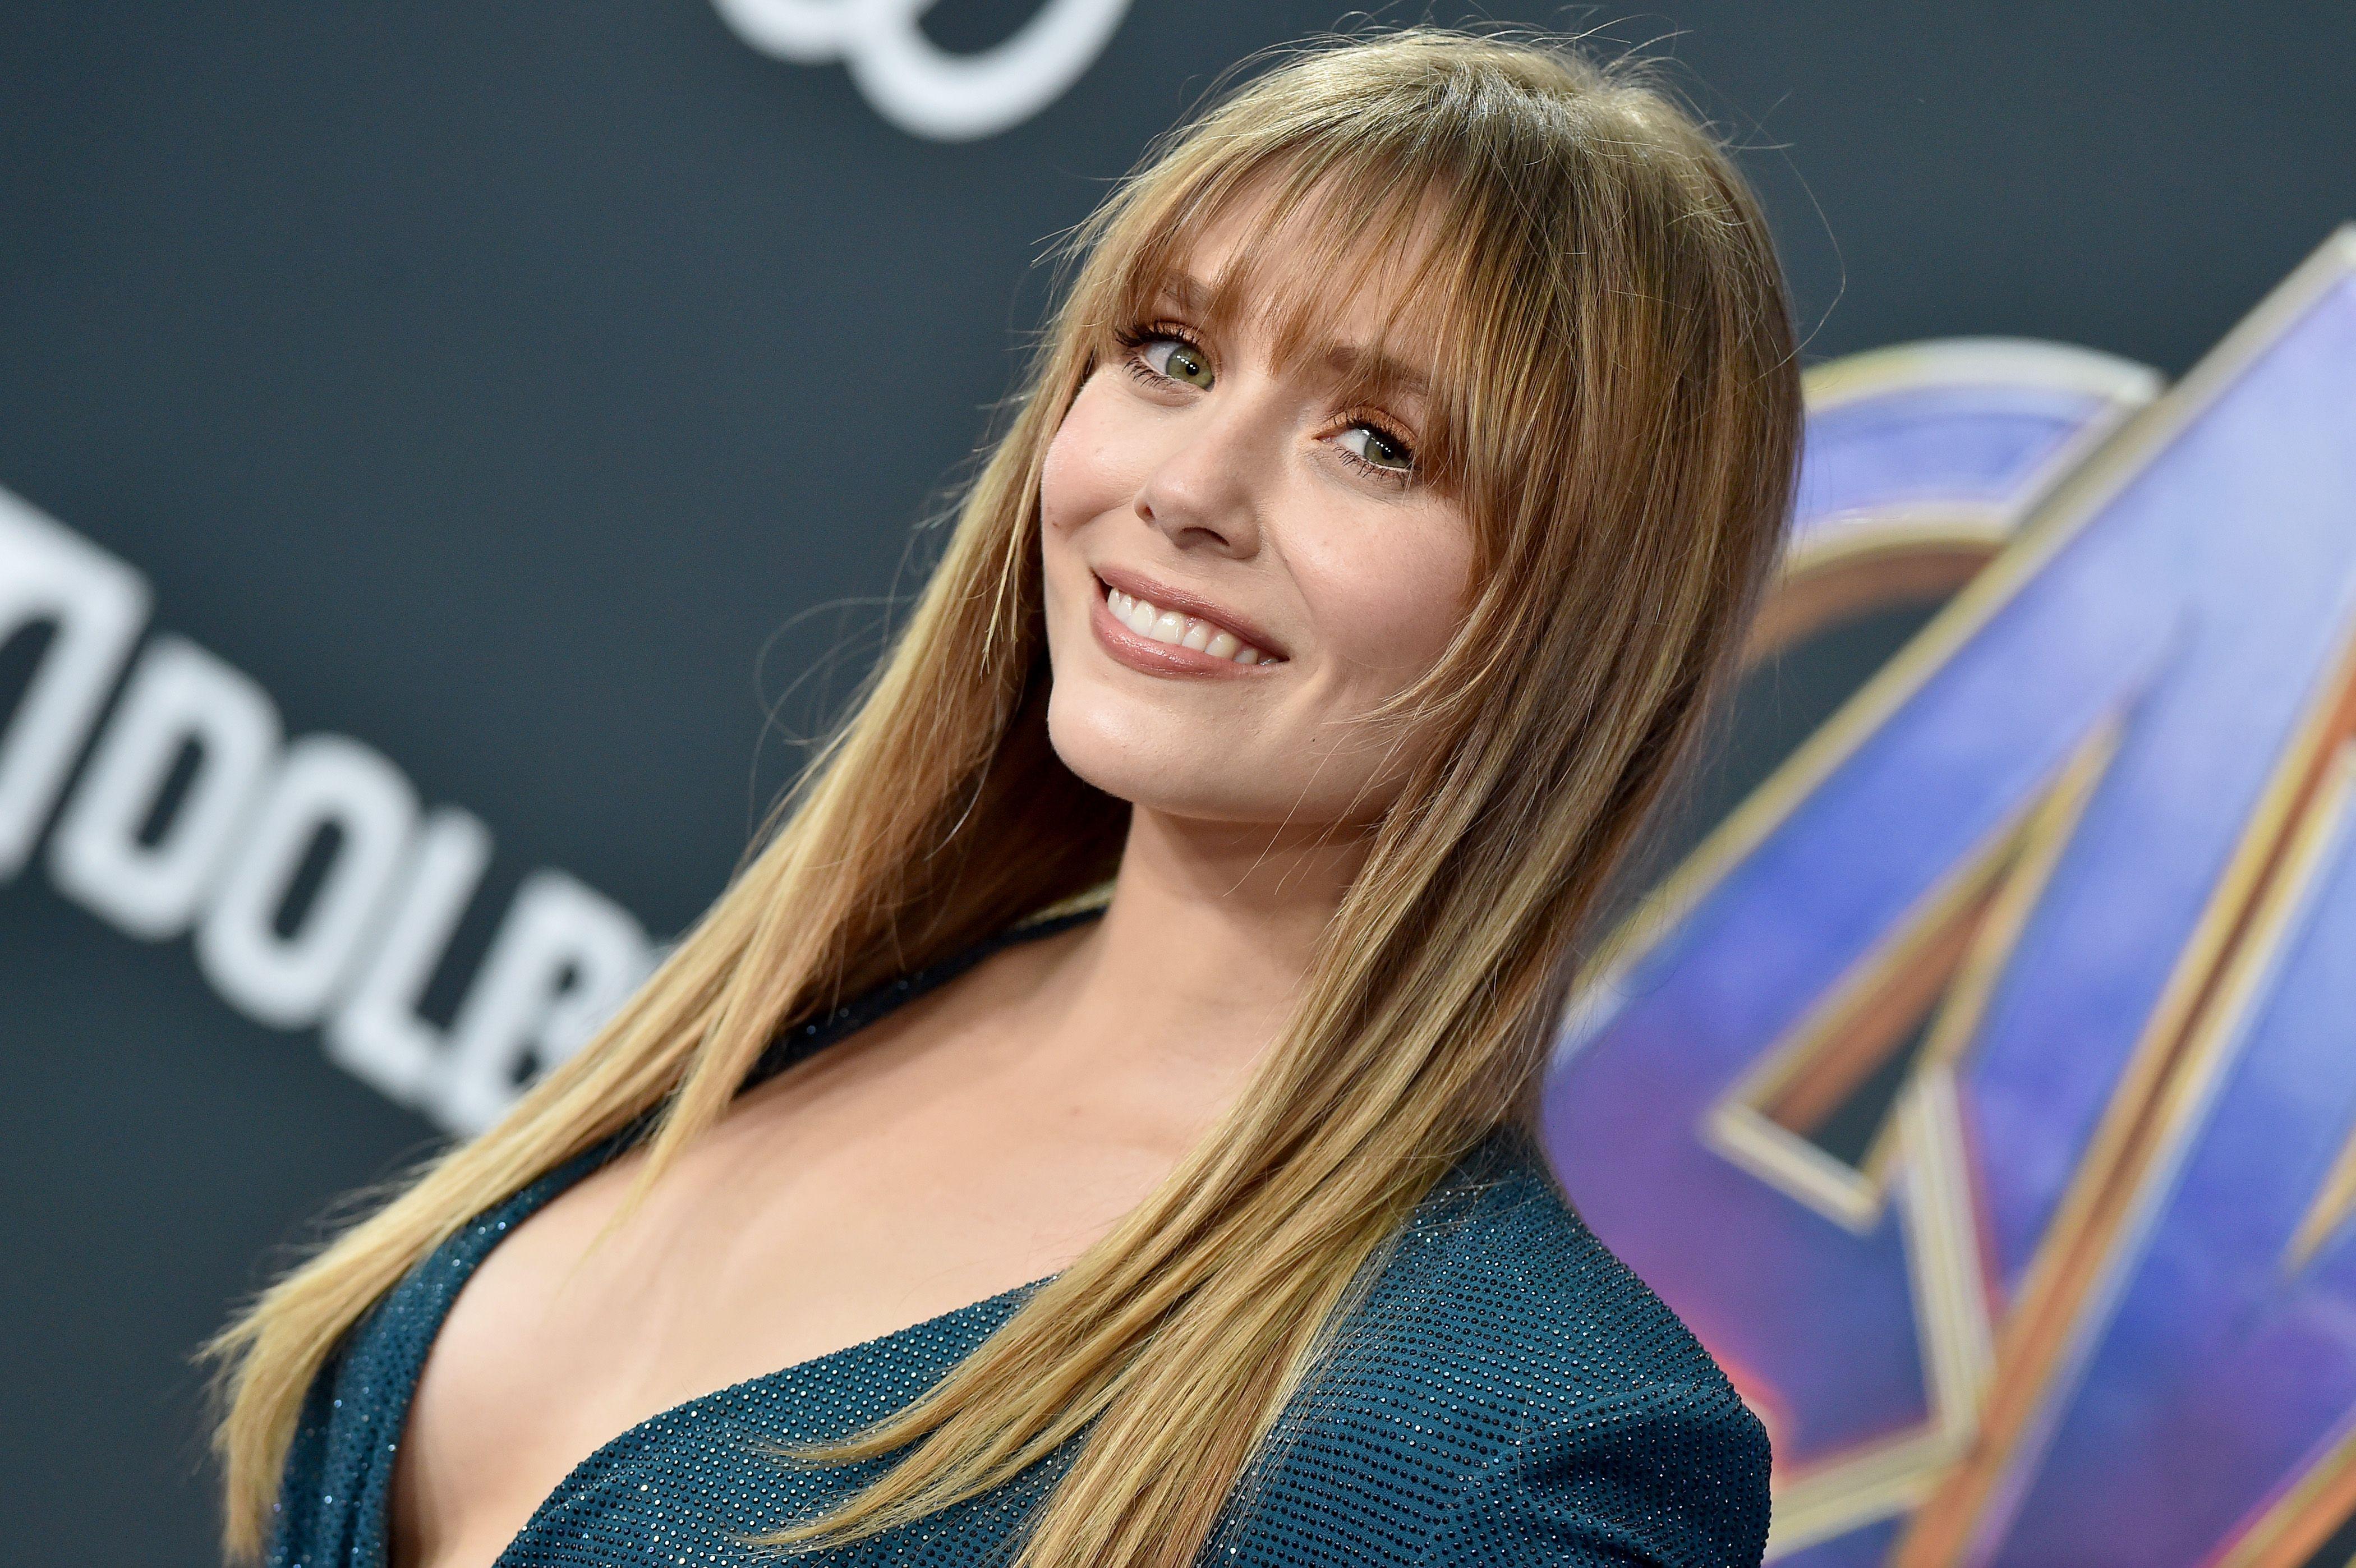 Elizabeth Olsen Auditioned For The Part Of Daenerys Targaryen In Game Of Thrones